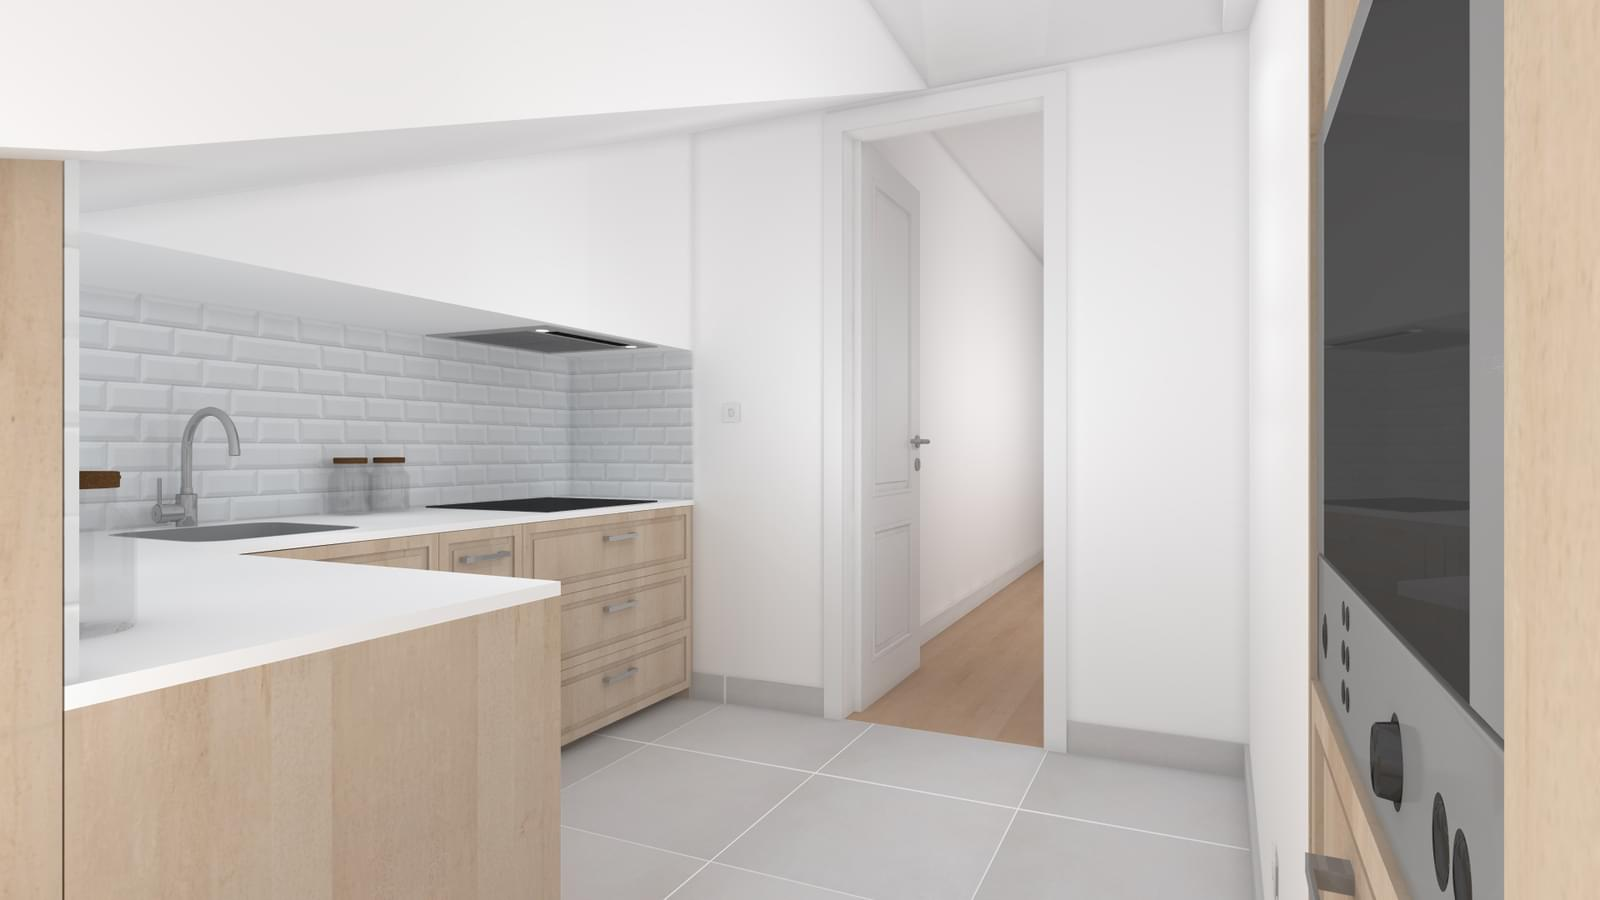 pf17054-apartamento-t2-lisboa-c907615d-28ce-48ca-b93c-e816a08bd6d4